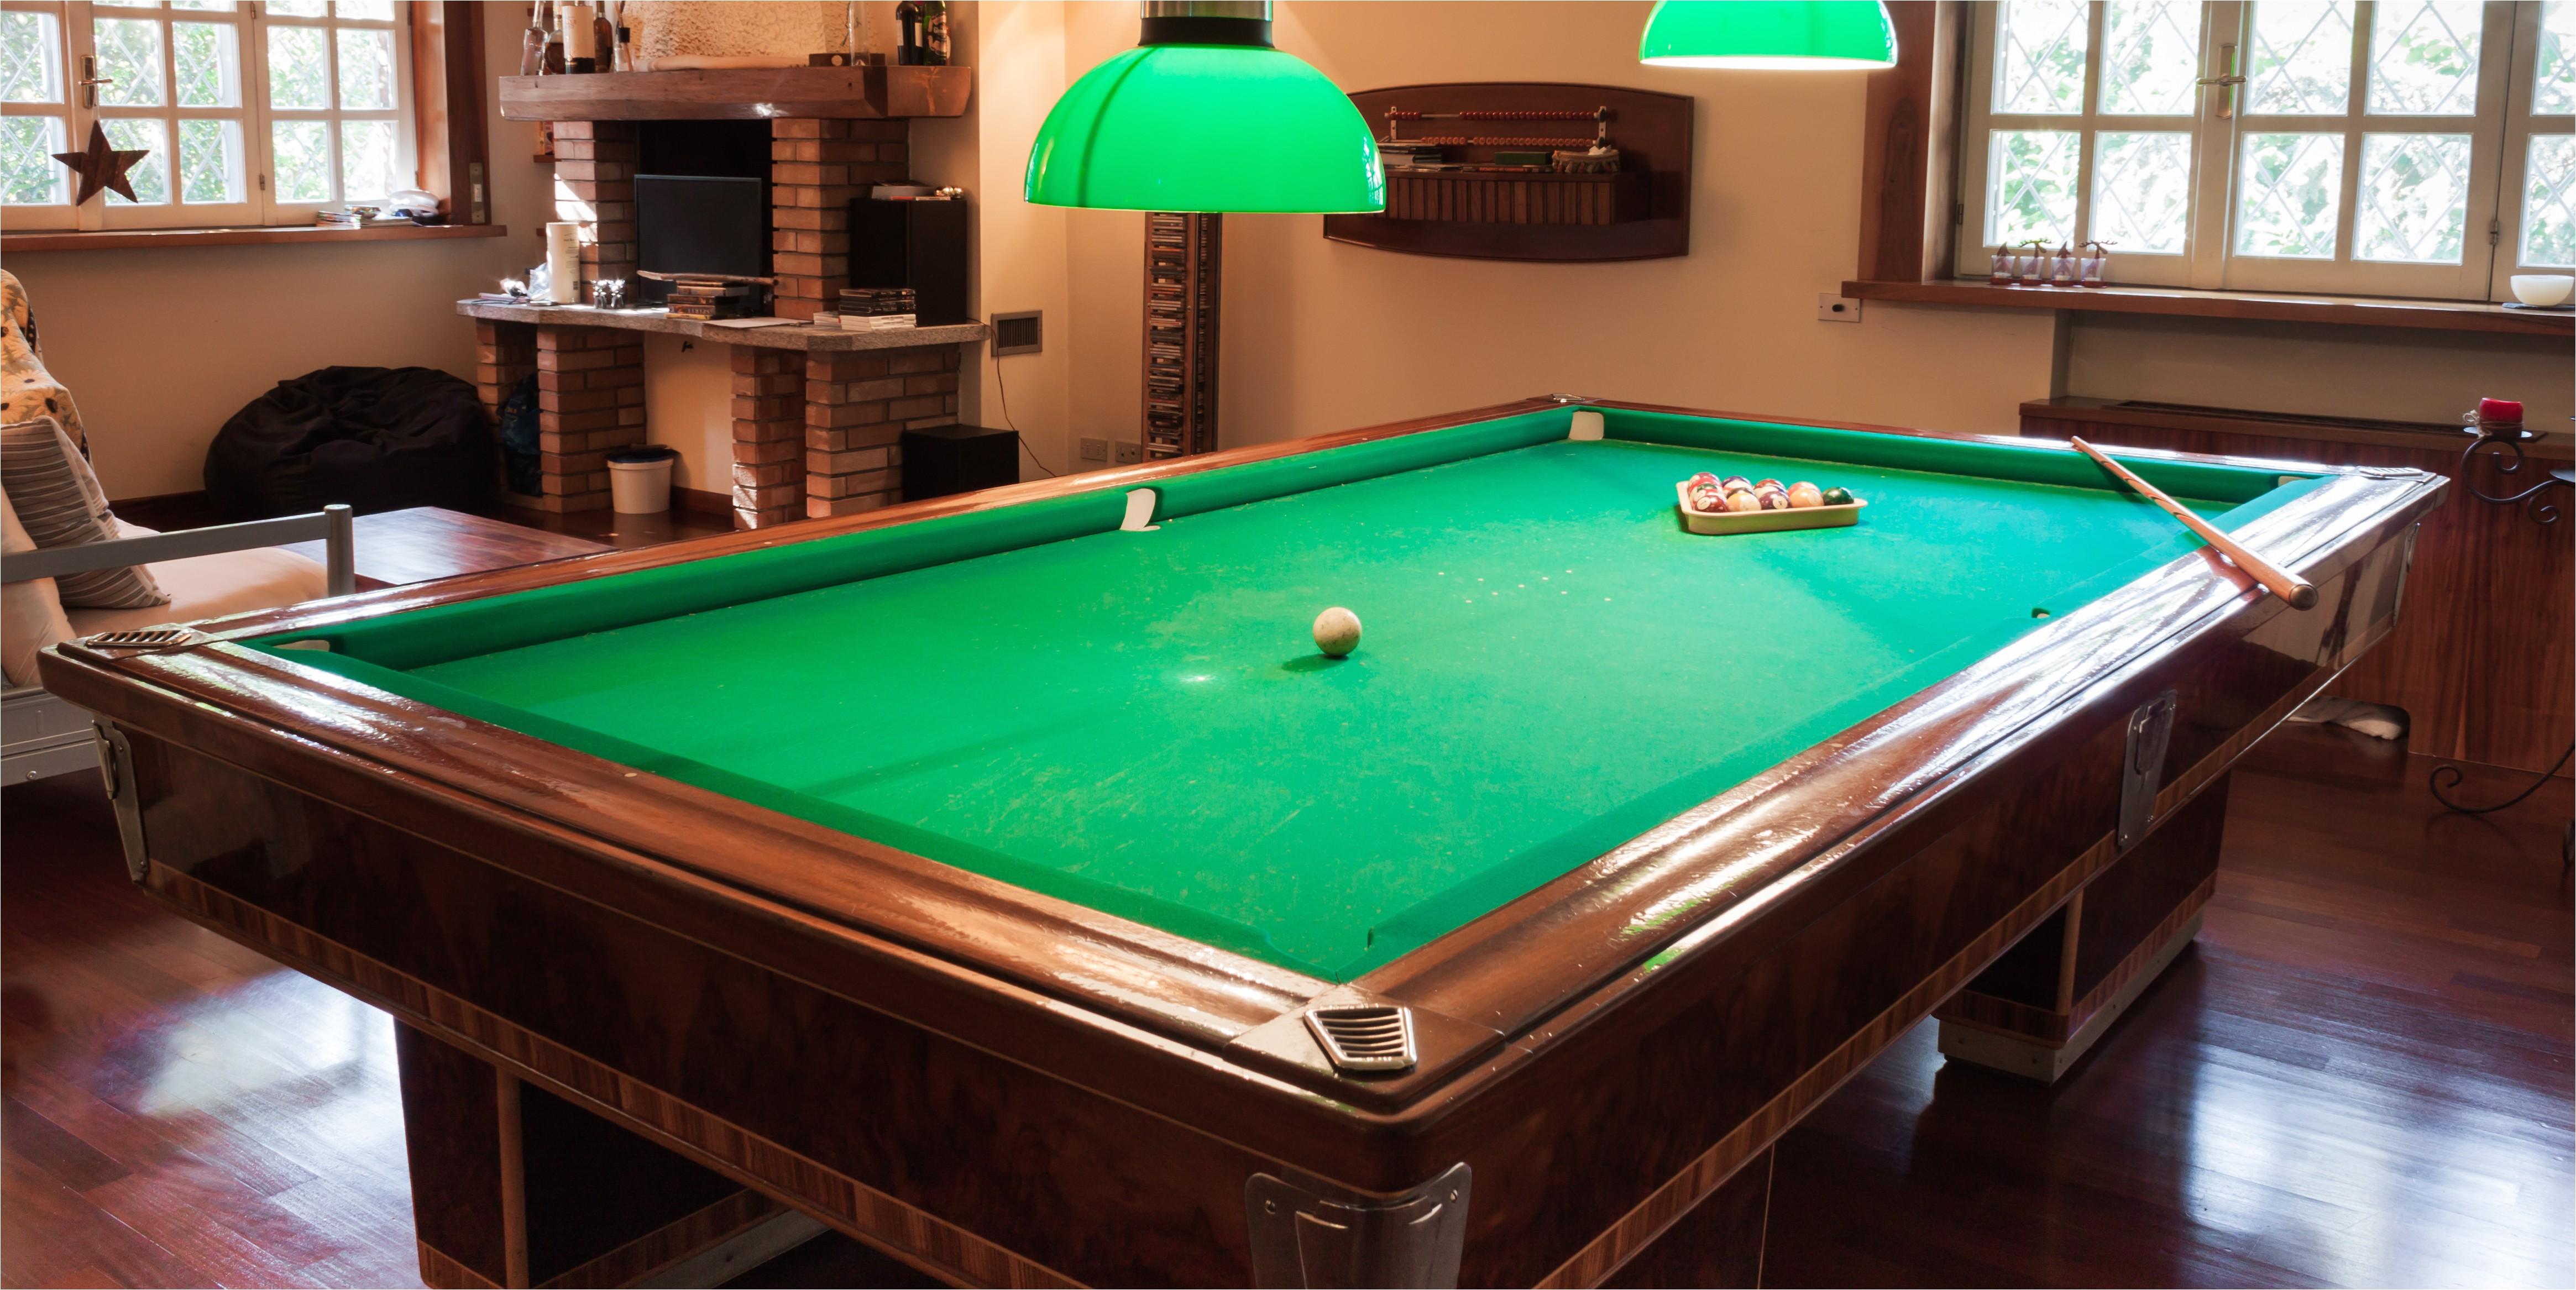 Pool Table Movers atlanta Professional Pool Table Movers Gallery Professional